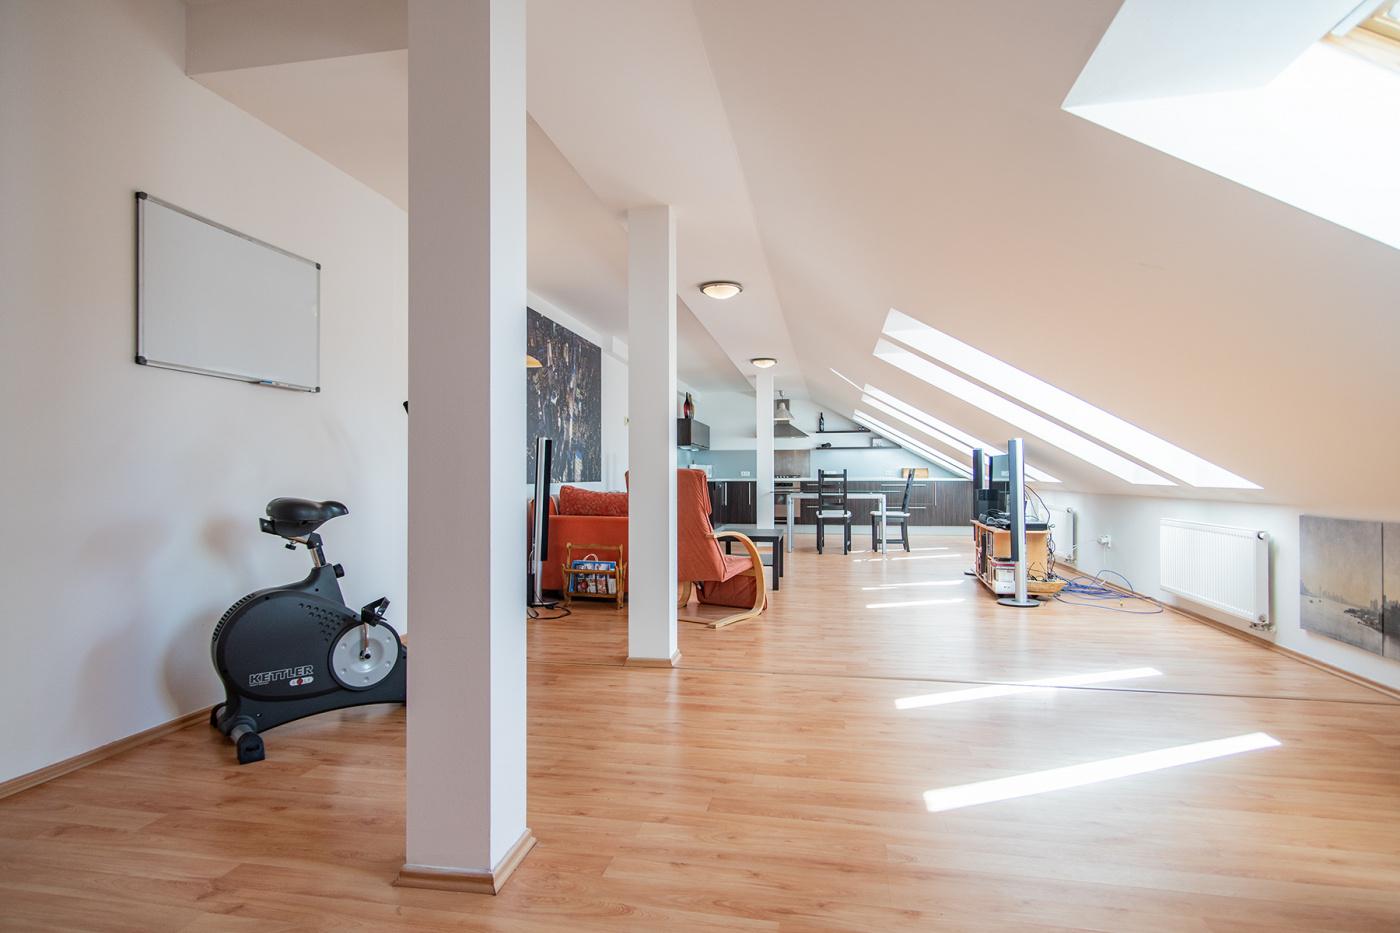 Půdní byt 3+kk, plocha 139 m², ulice Táborská, Praha 4 - Nusle | 3